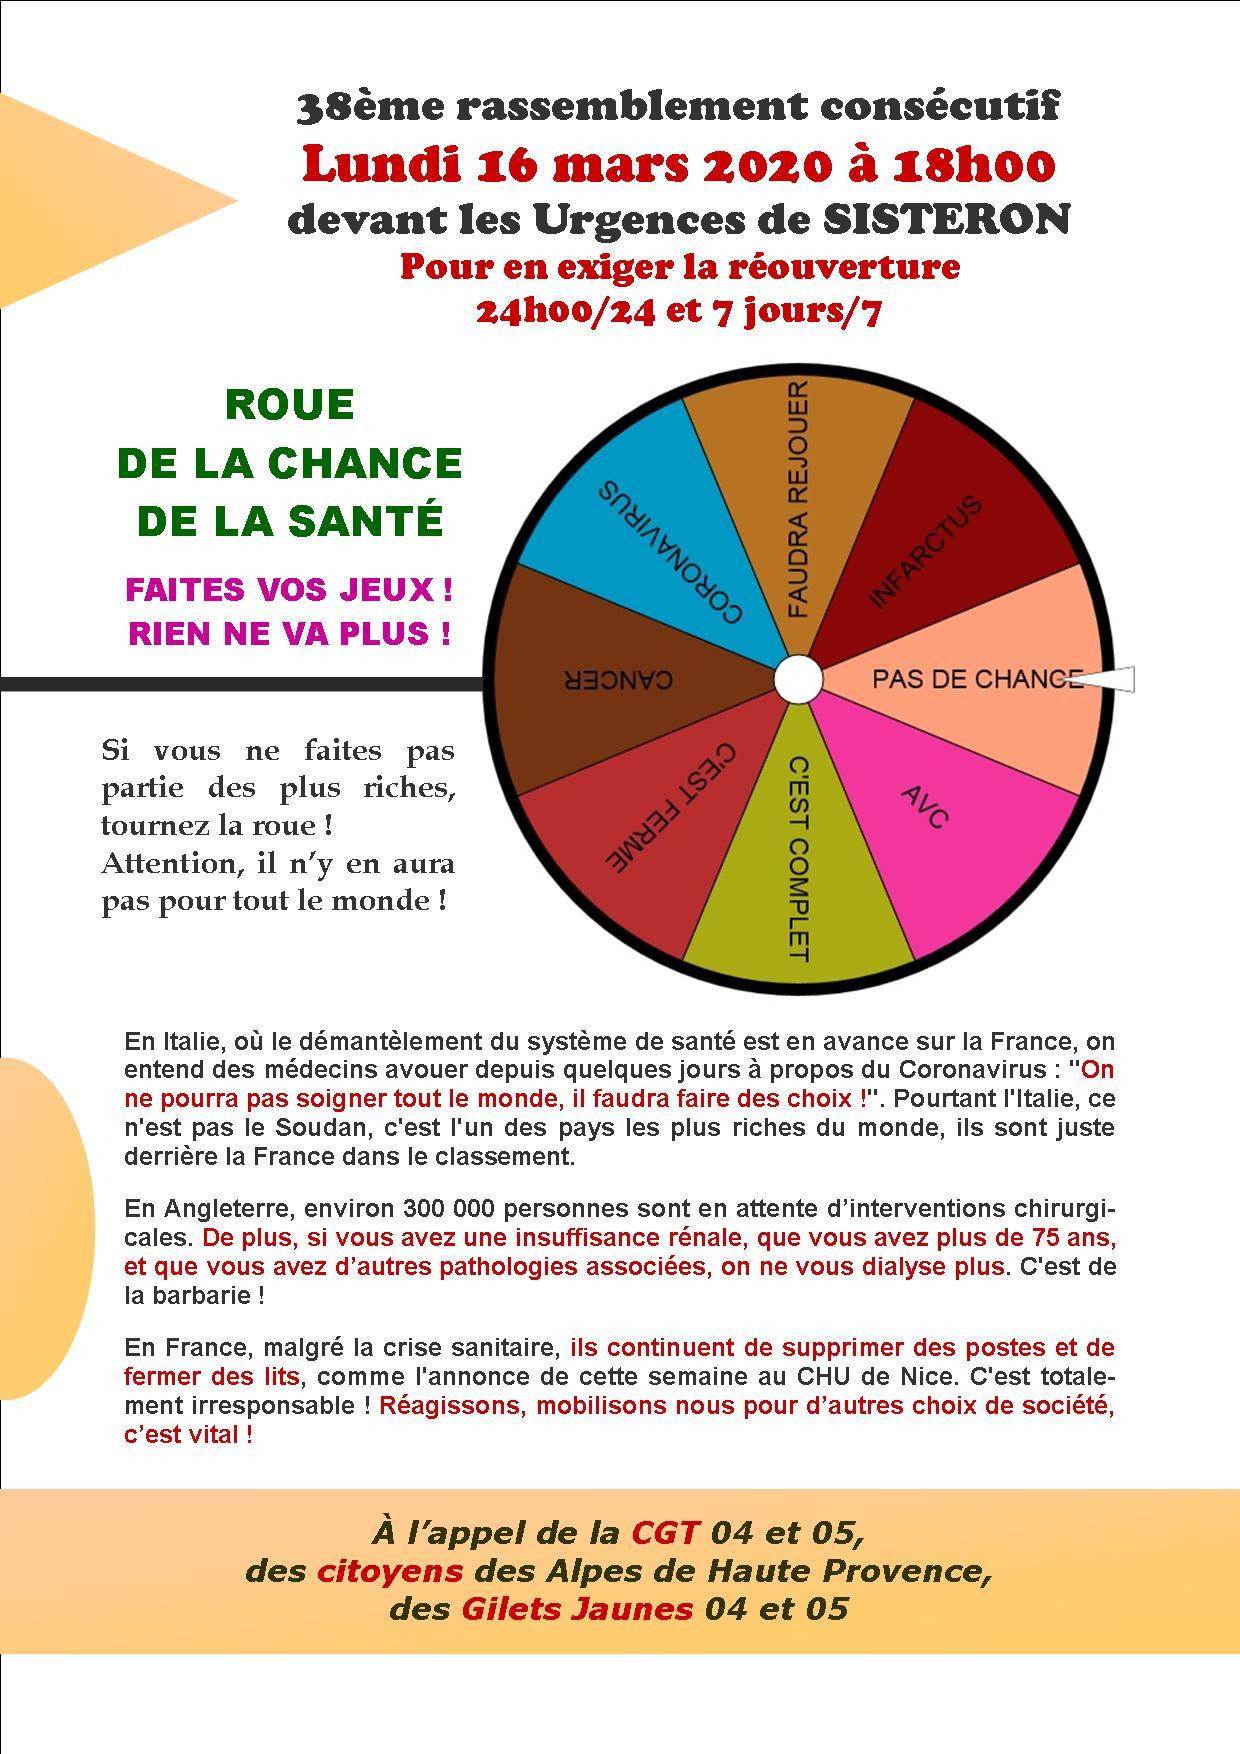 Tract urgences de sisteron Coronavirus 16 mars 2020